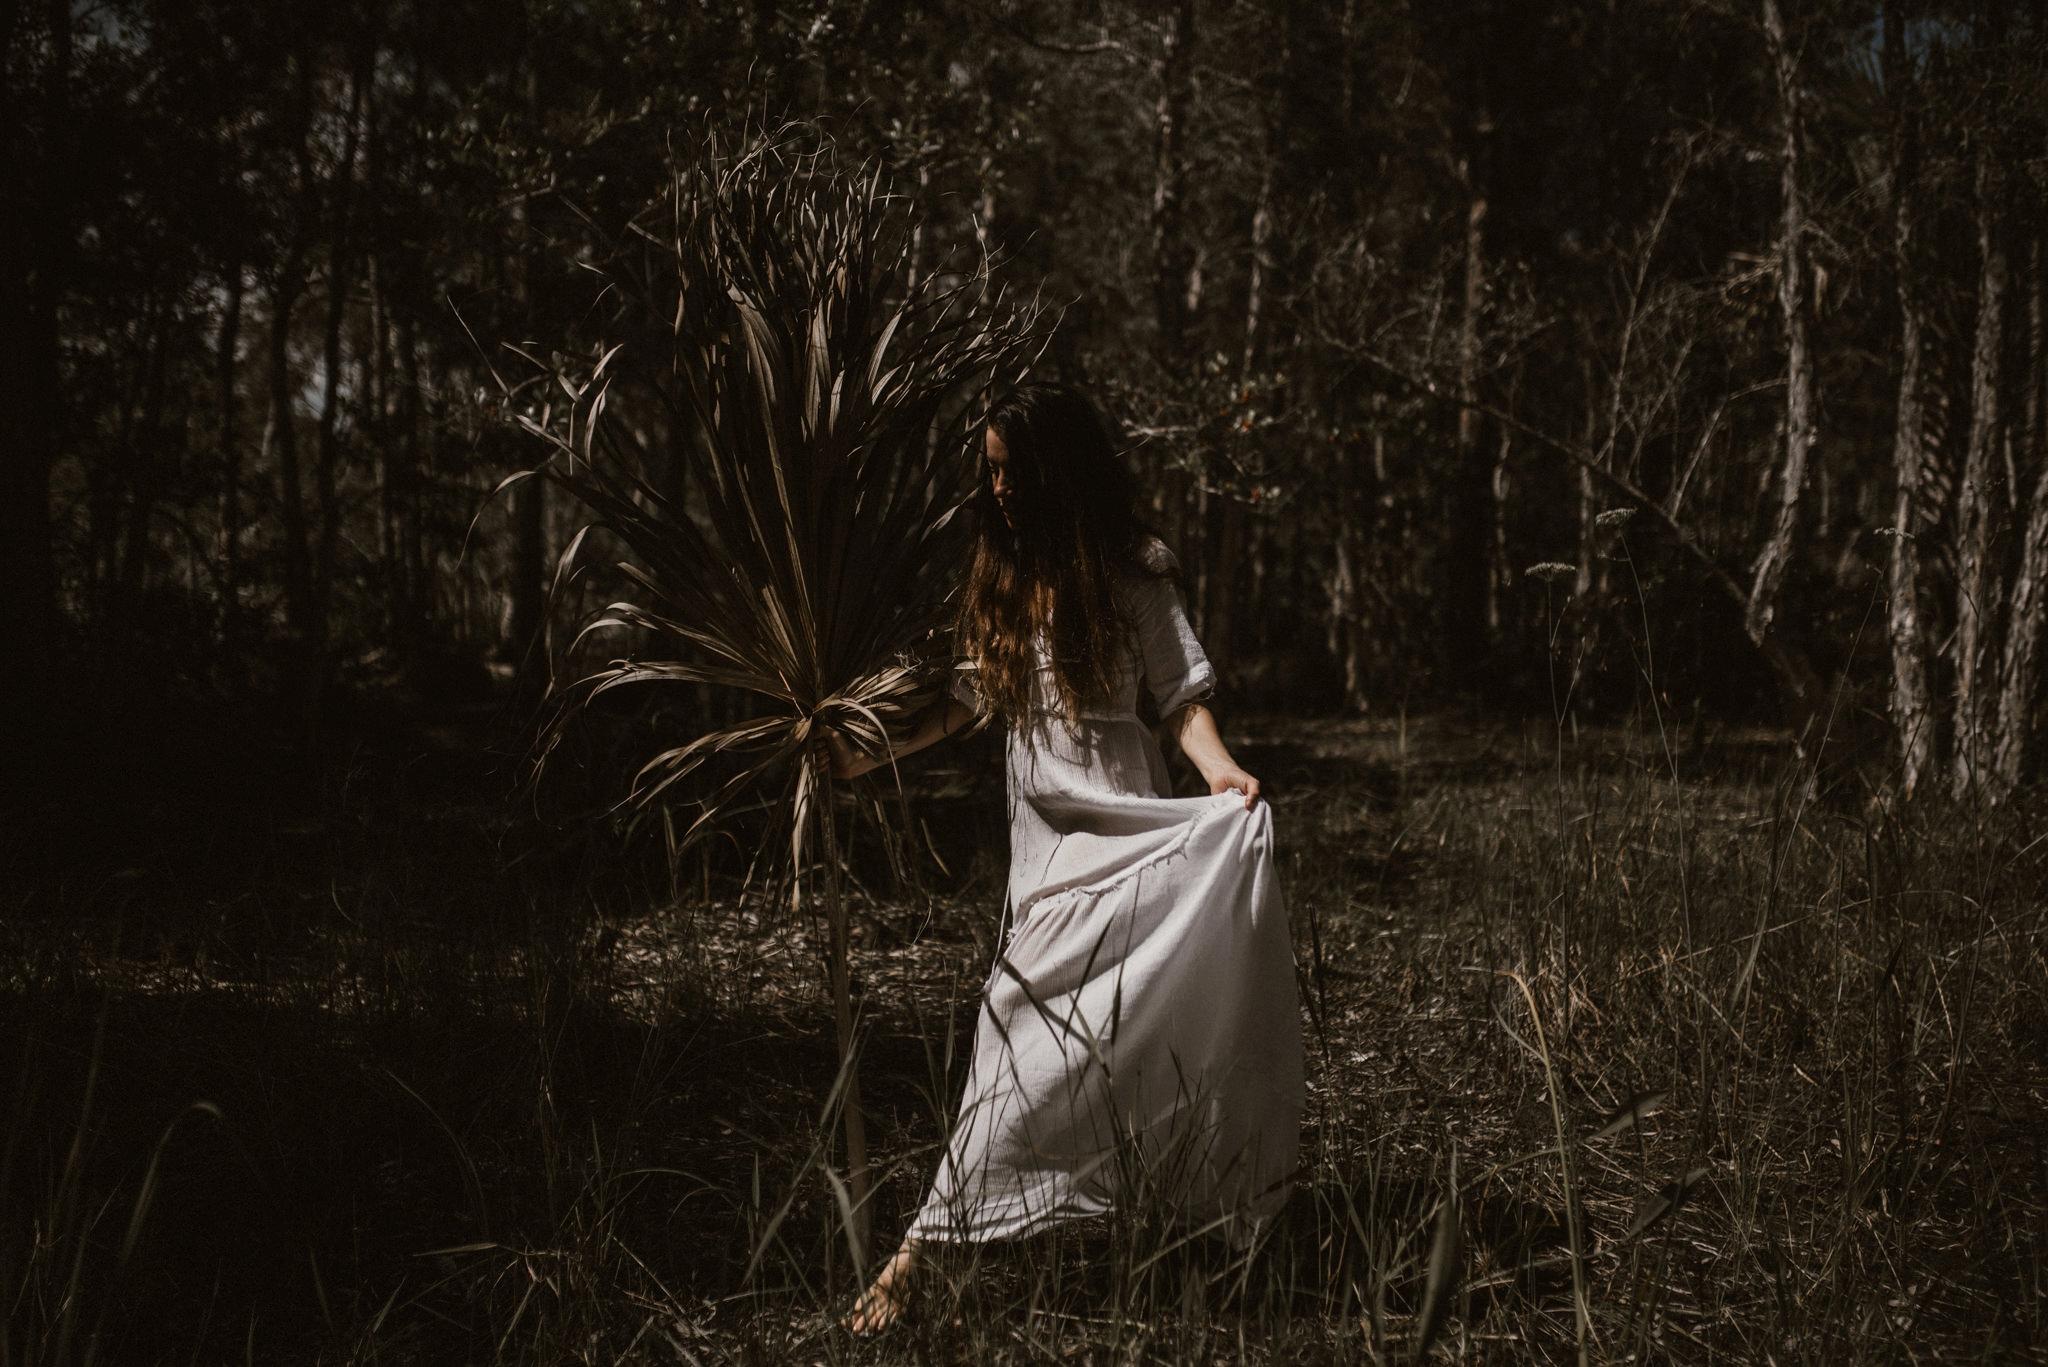 twyla jones photography - traveling dress--22_treasure coast florida.jpg